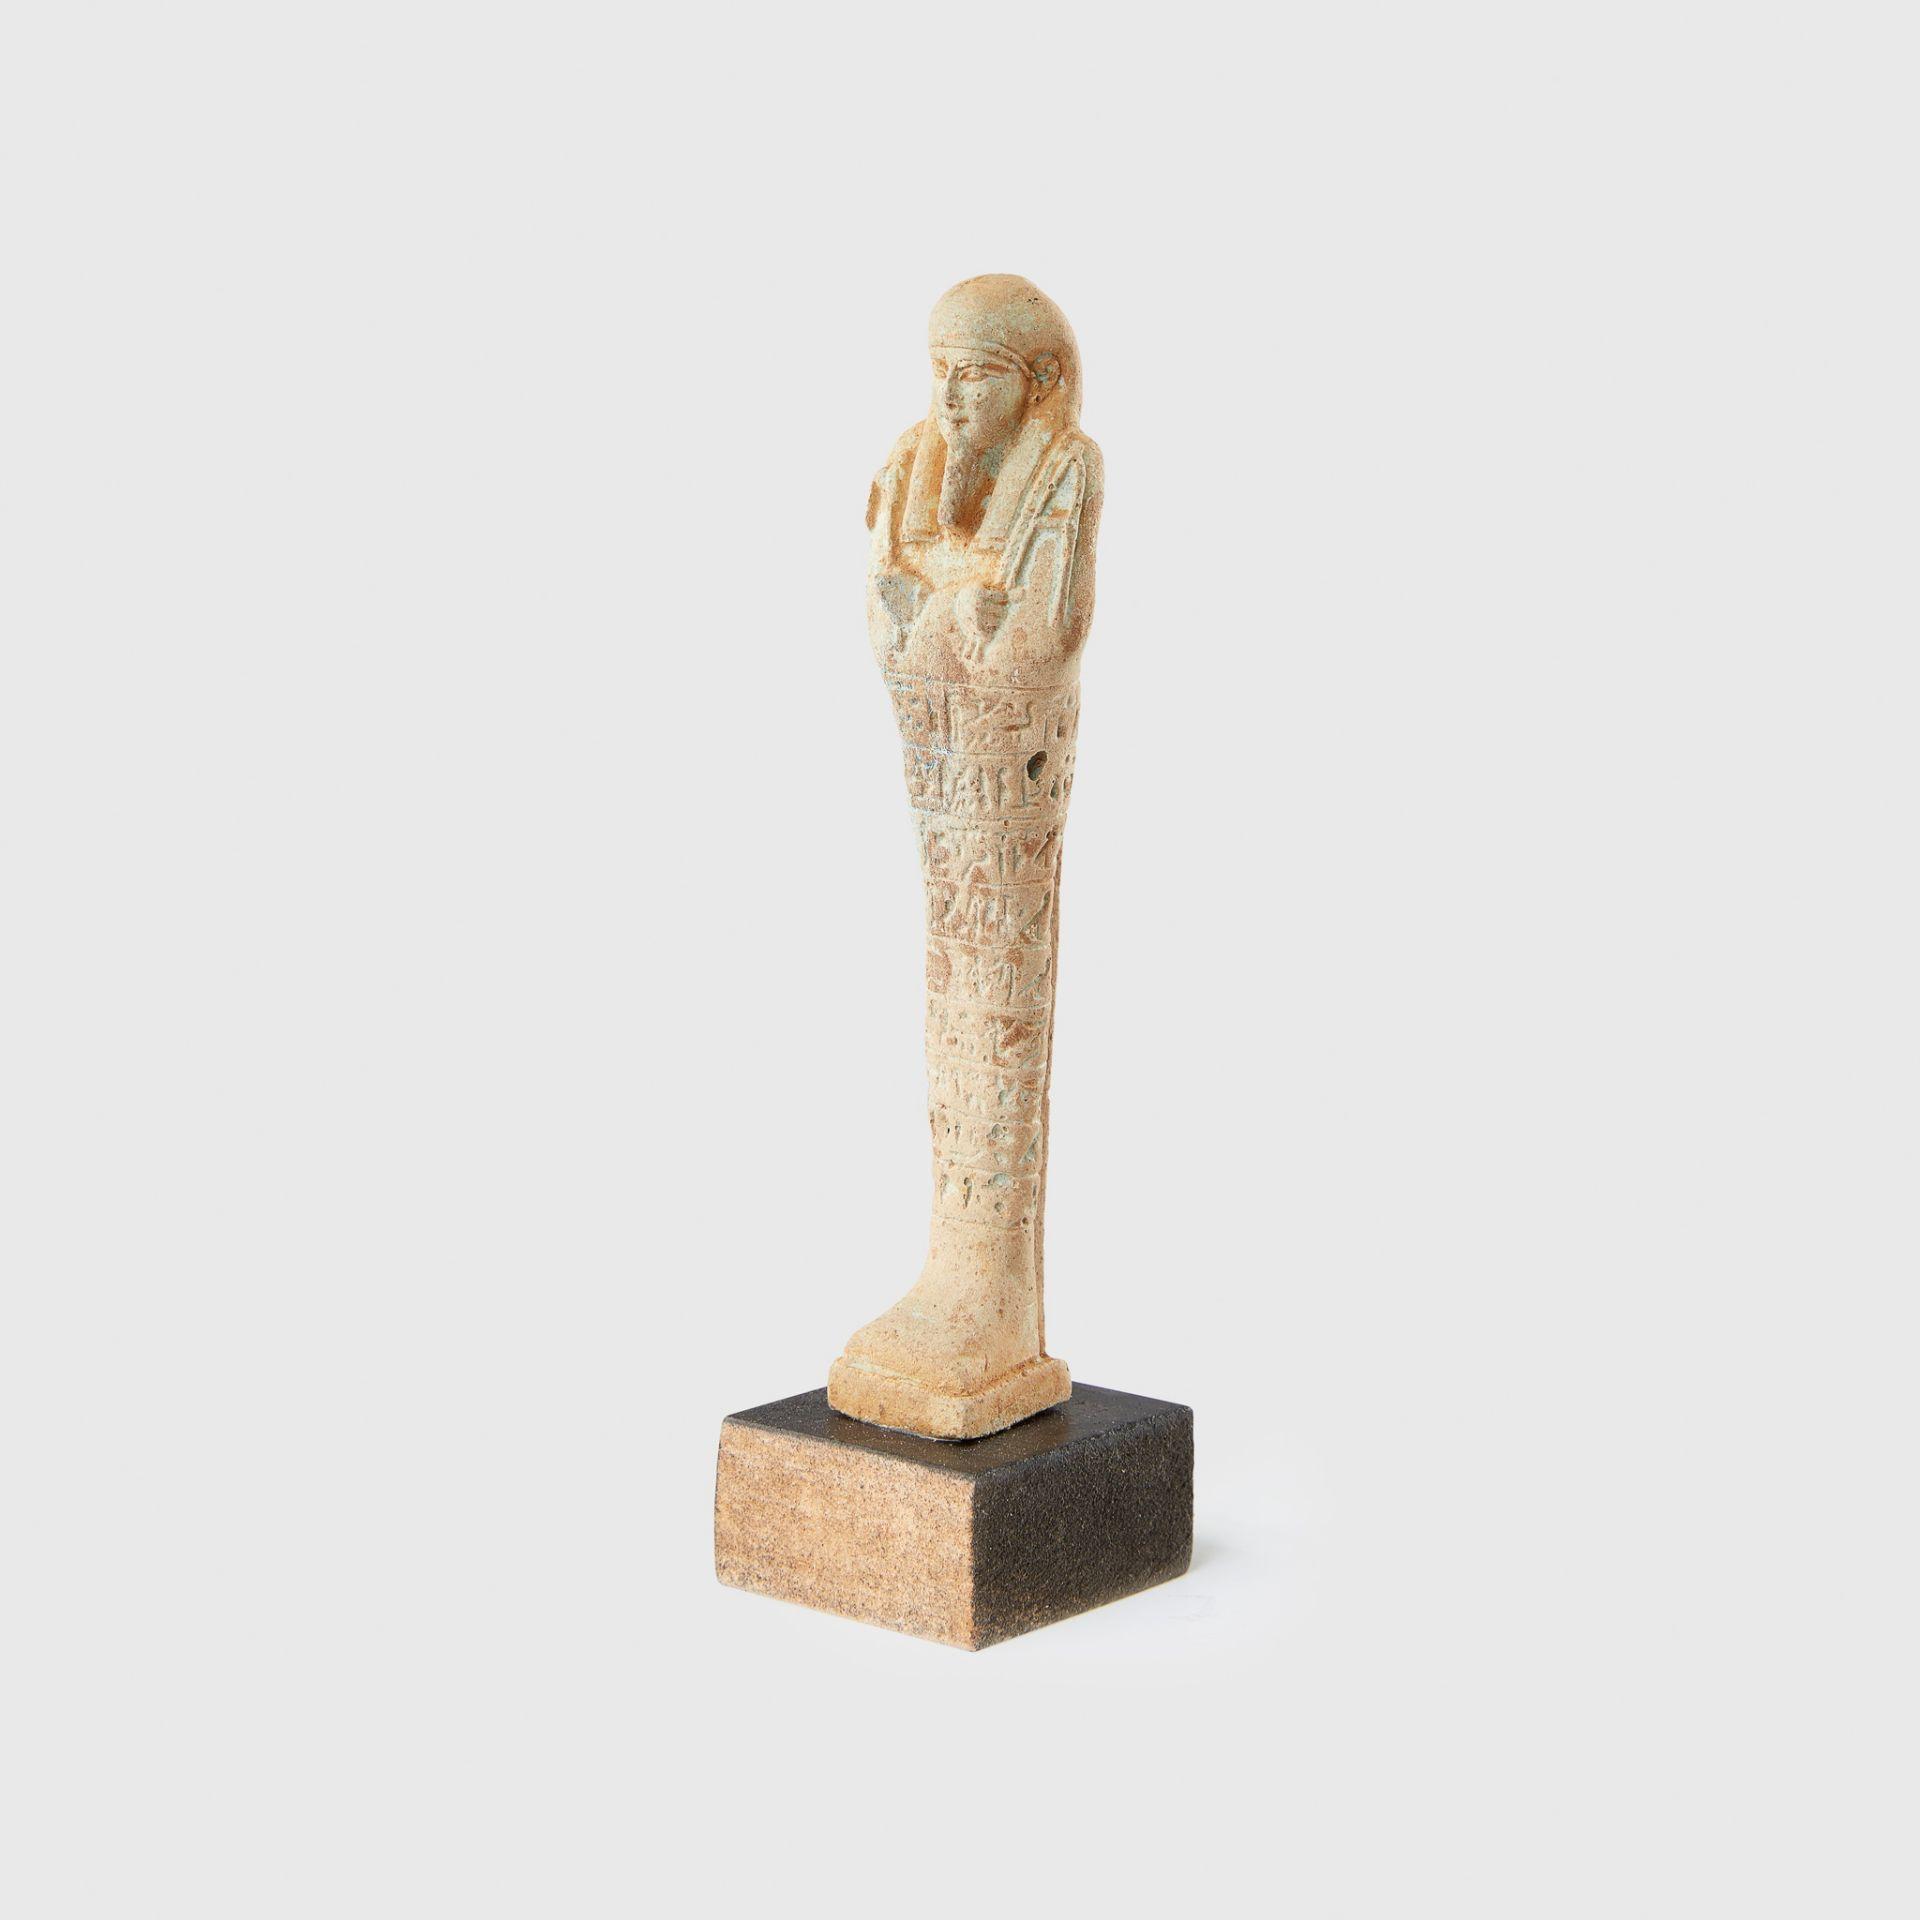 SHABTI EGYPT, LATE PERIOD c. 664 - 332 B.C. - Image 2 of 2